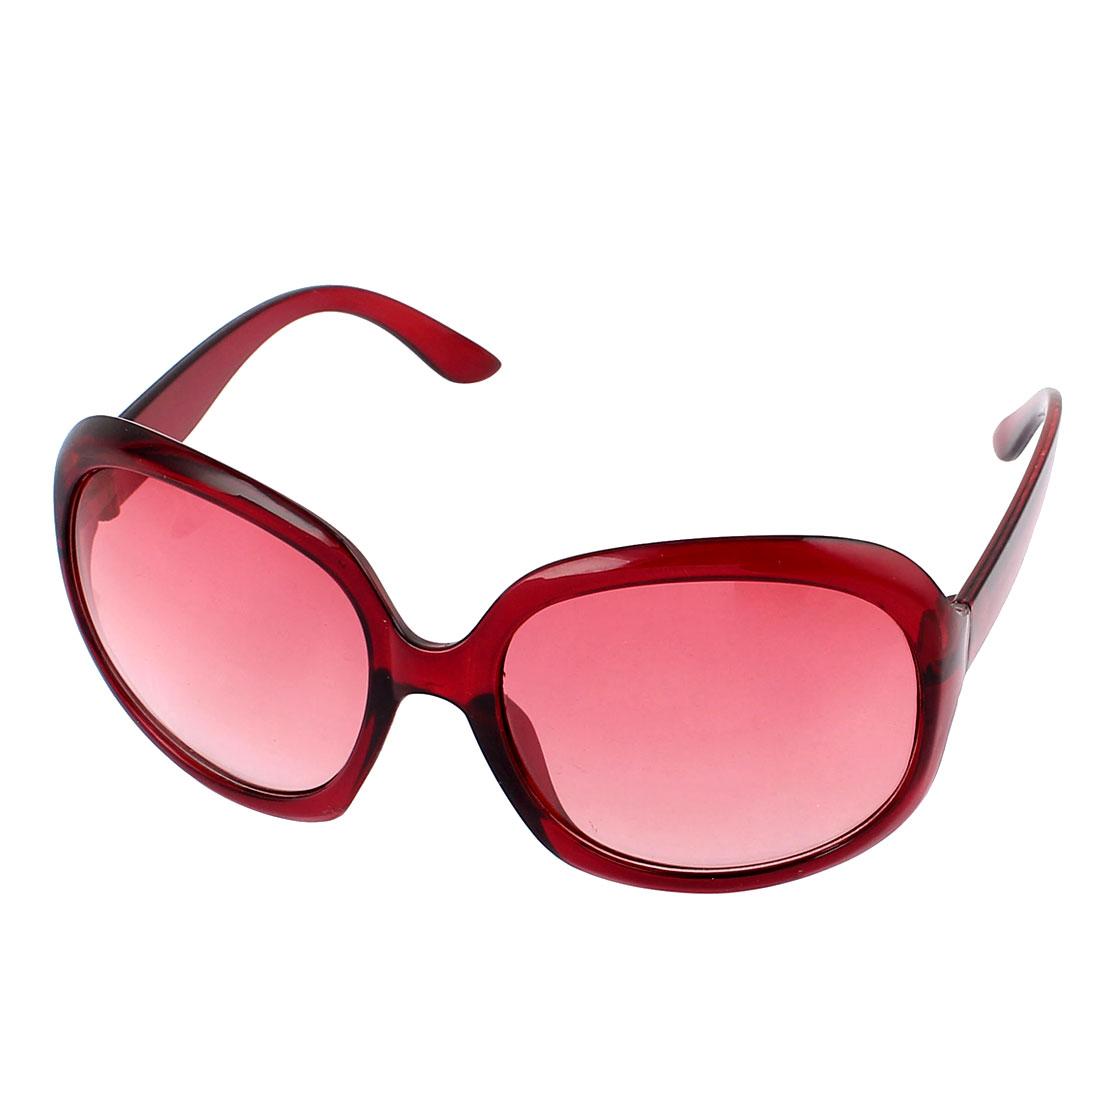 Woman Red Plastic Full Rim Gradient Square Lens Single Bridge Sunglasses Eyeswear Glasses Eyes Protector